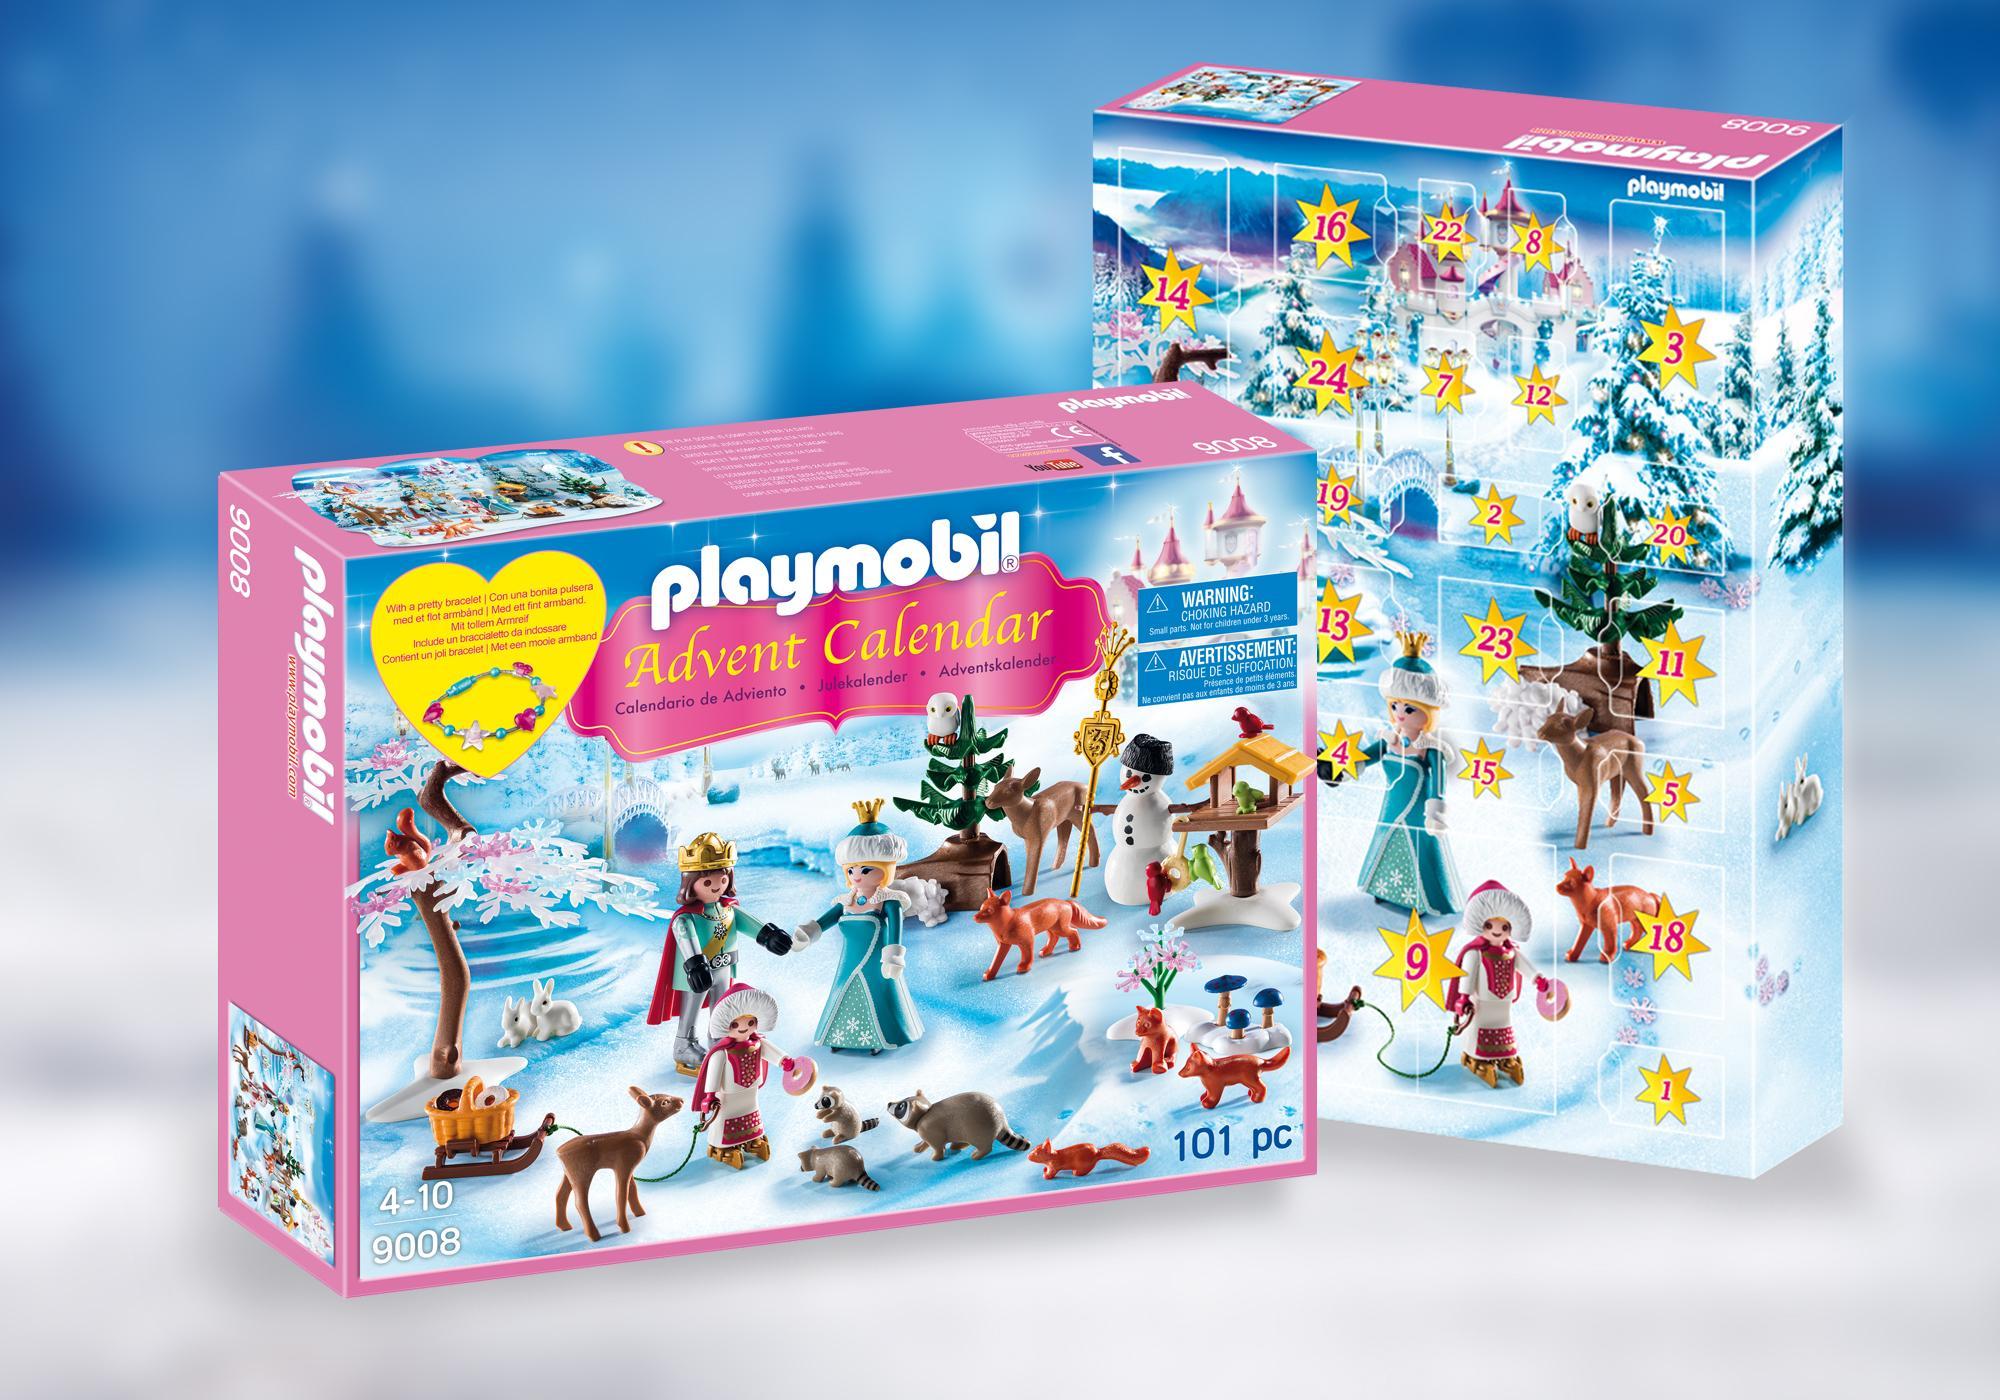 http://media.playmobil.com/i/playmobil/9008_product_detail/Advent Calender Royal Ice Skating Trip